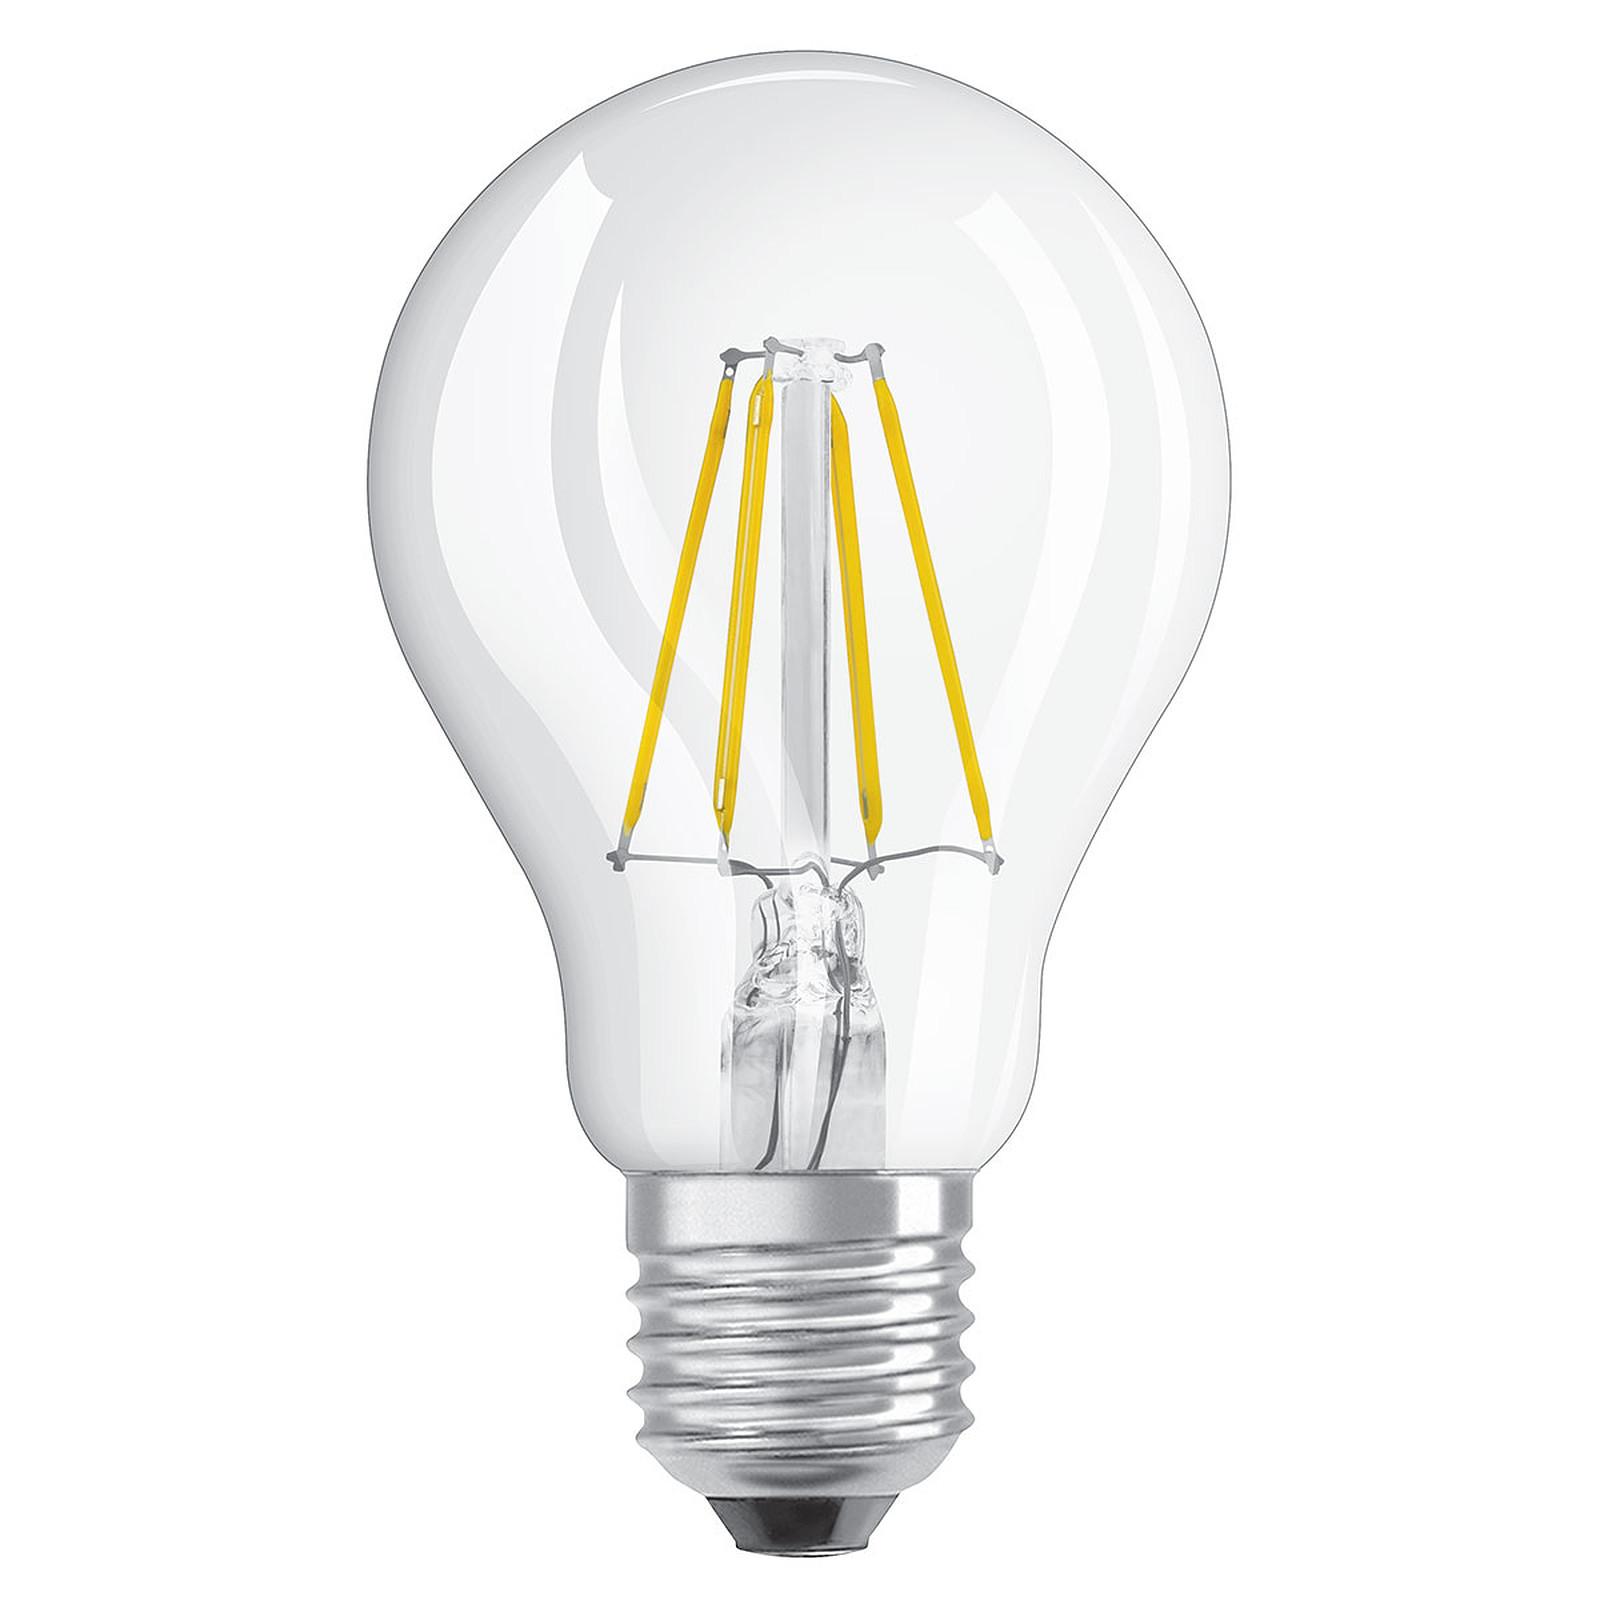 OSRAM Ampoule LED Retrofit standard E27 4W (40W) A++